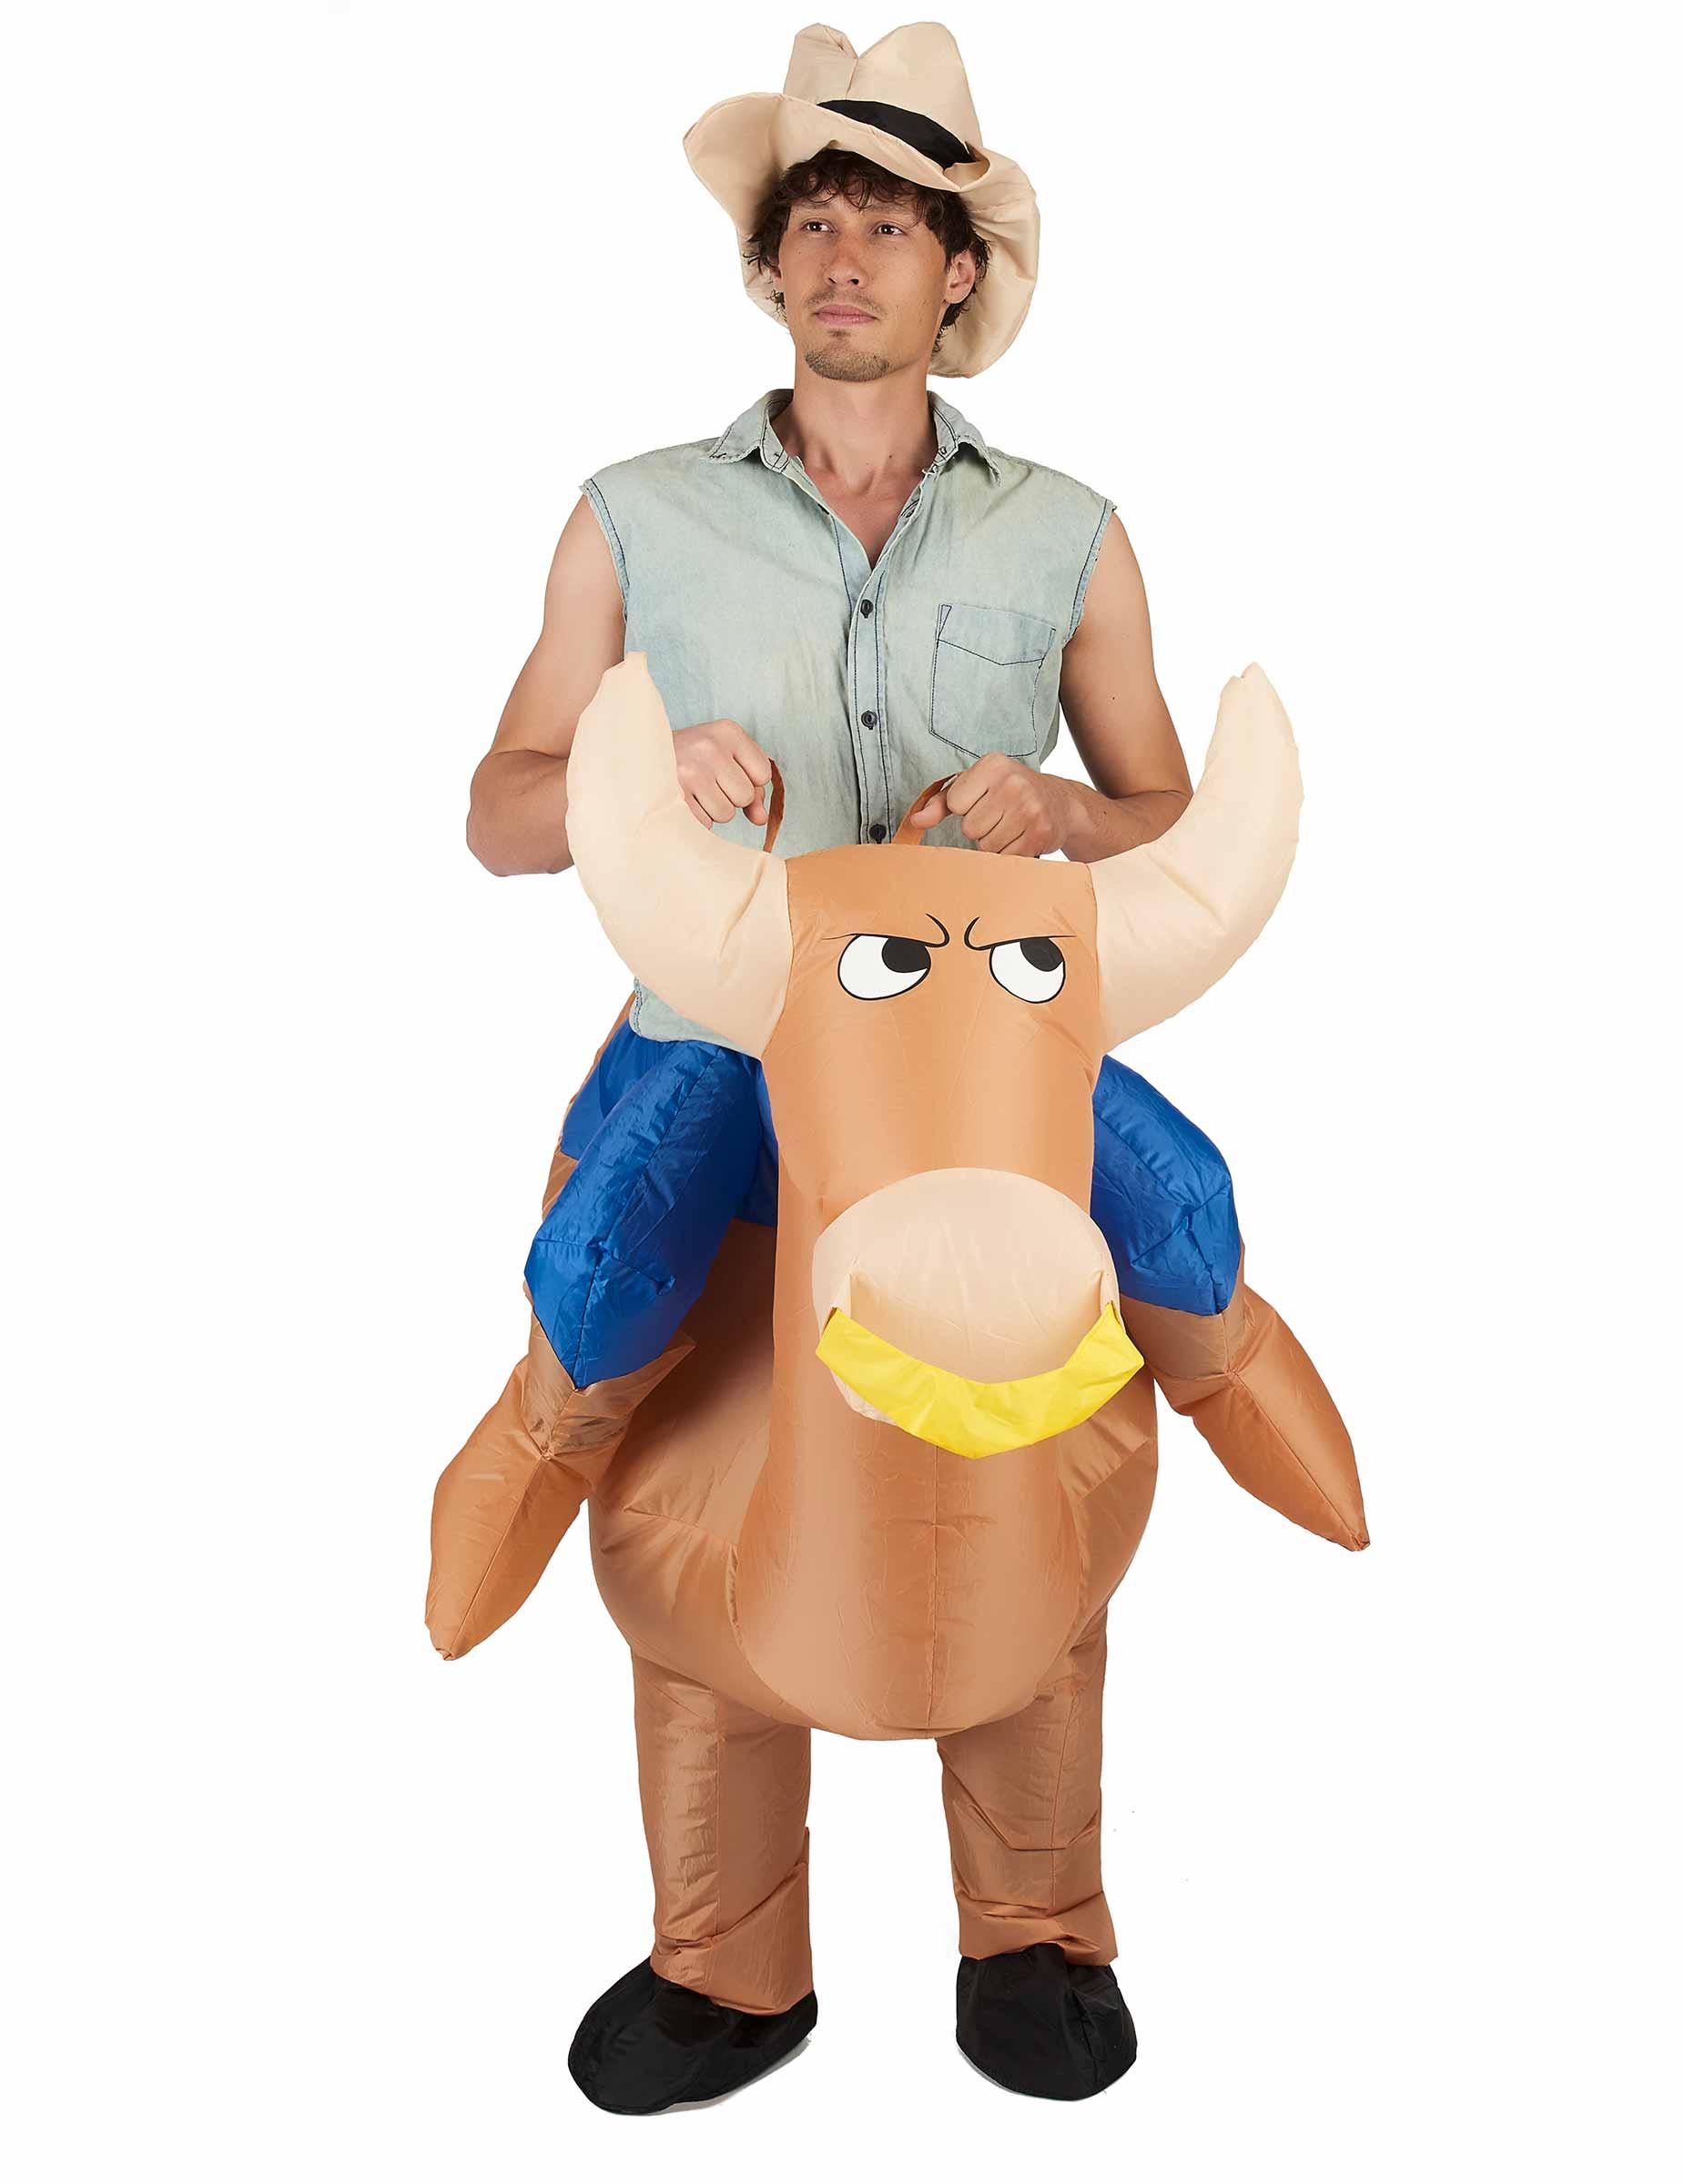 aufblasbares carry me kost m rodeo reiter braun blau g nstige faschings kost me bei karneval. Black Bedroom Furniture Sets. Home Design Ideas